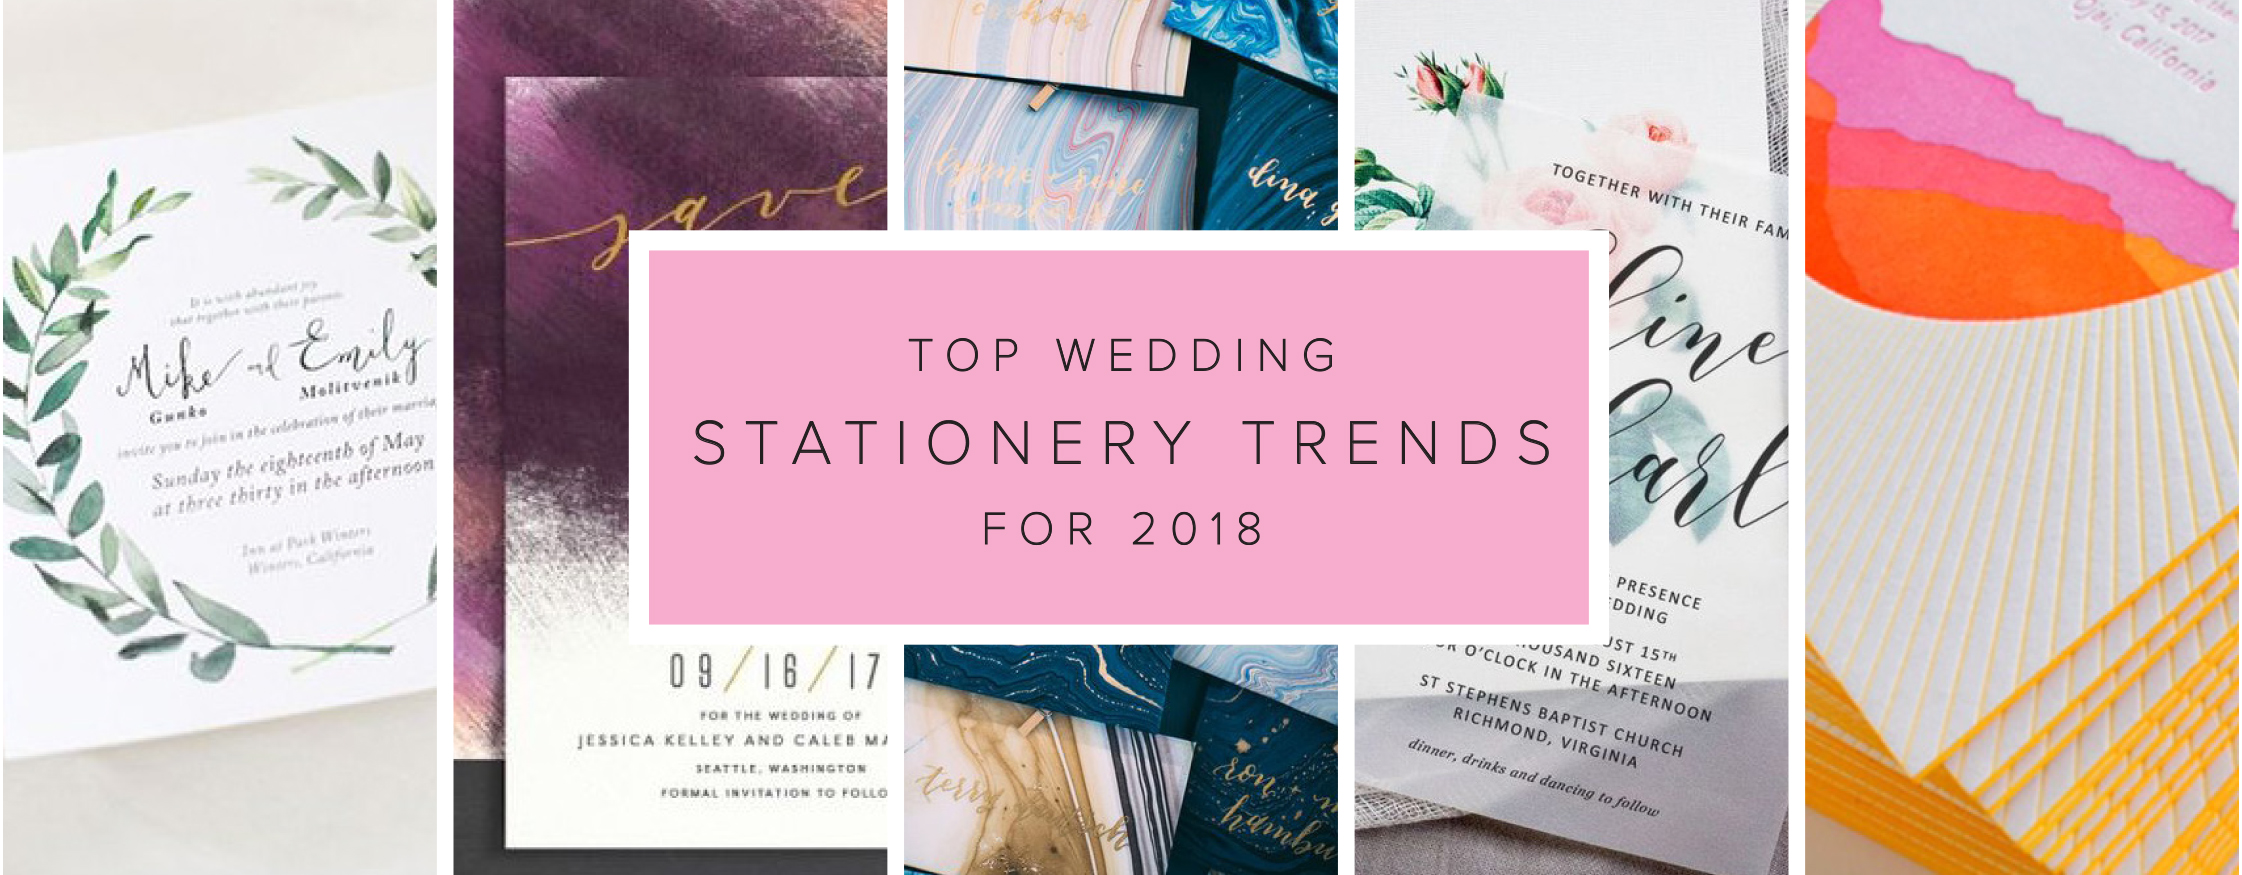 2018 Wedding Trends.jpg